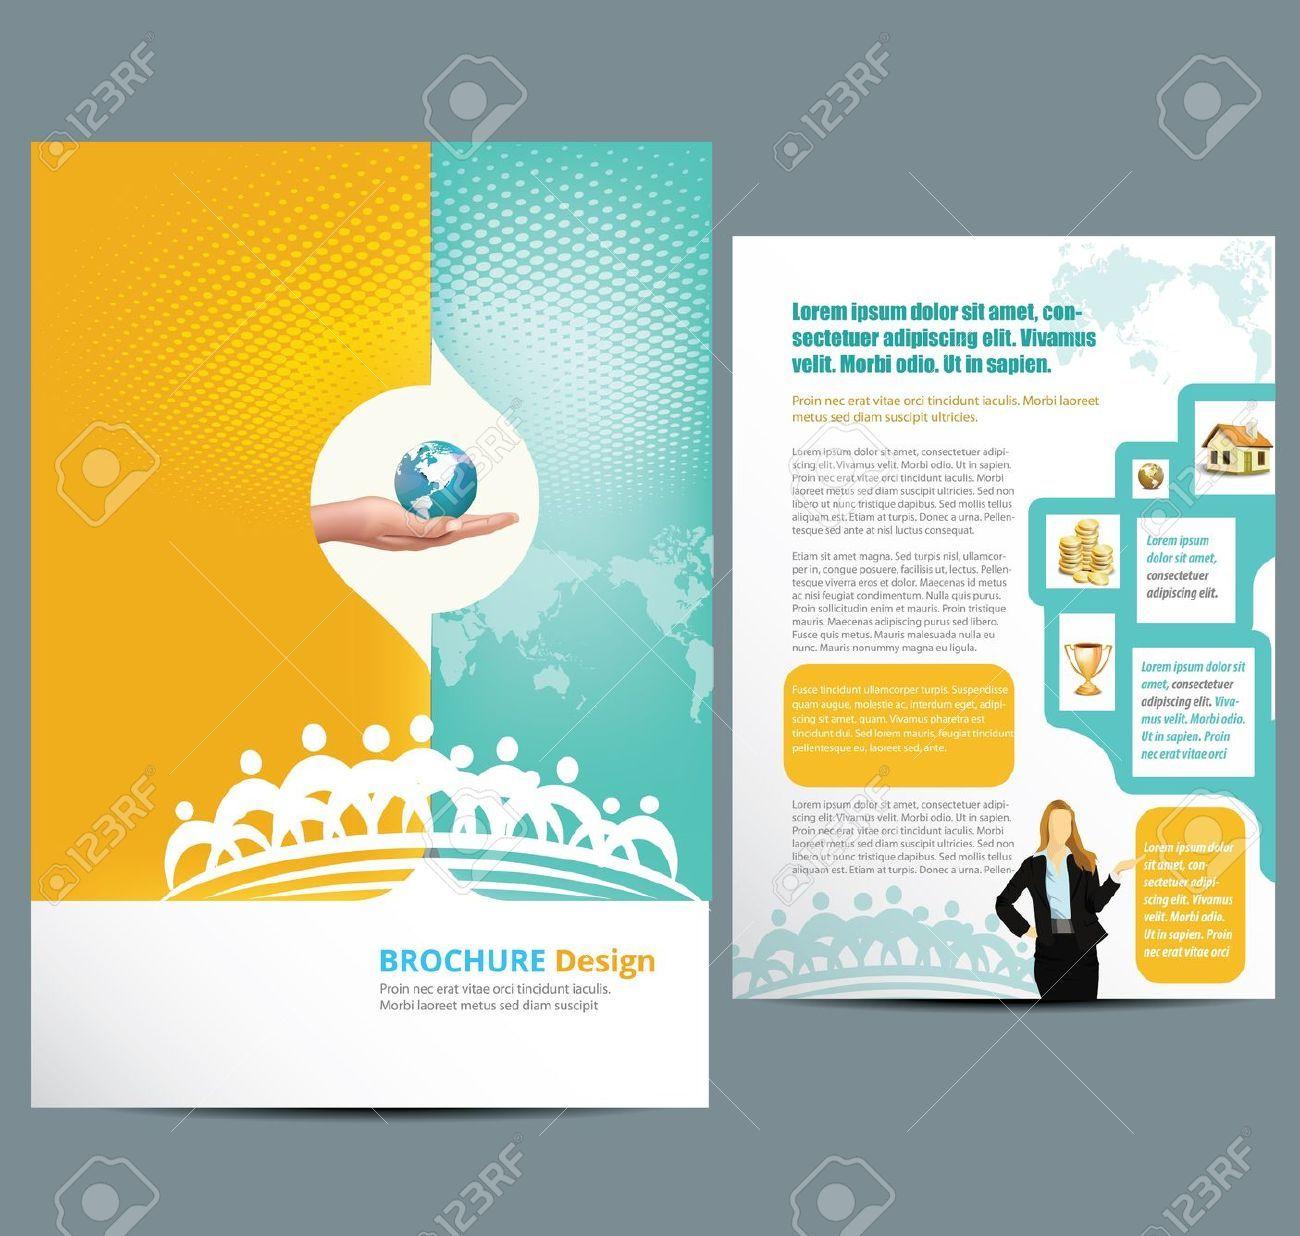 Cool Marketing Brochure Templates Set Marketing Strategies - Marketing brochure templates